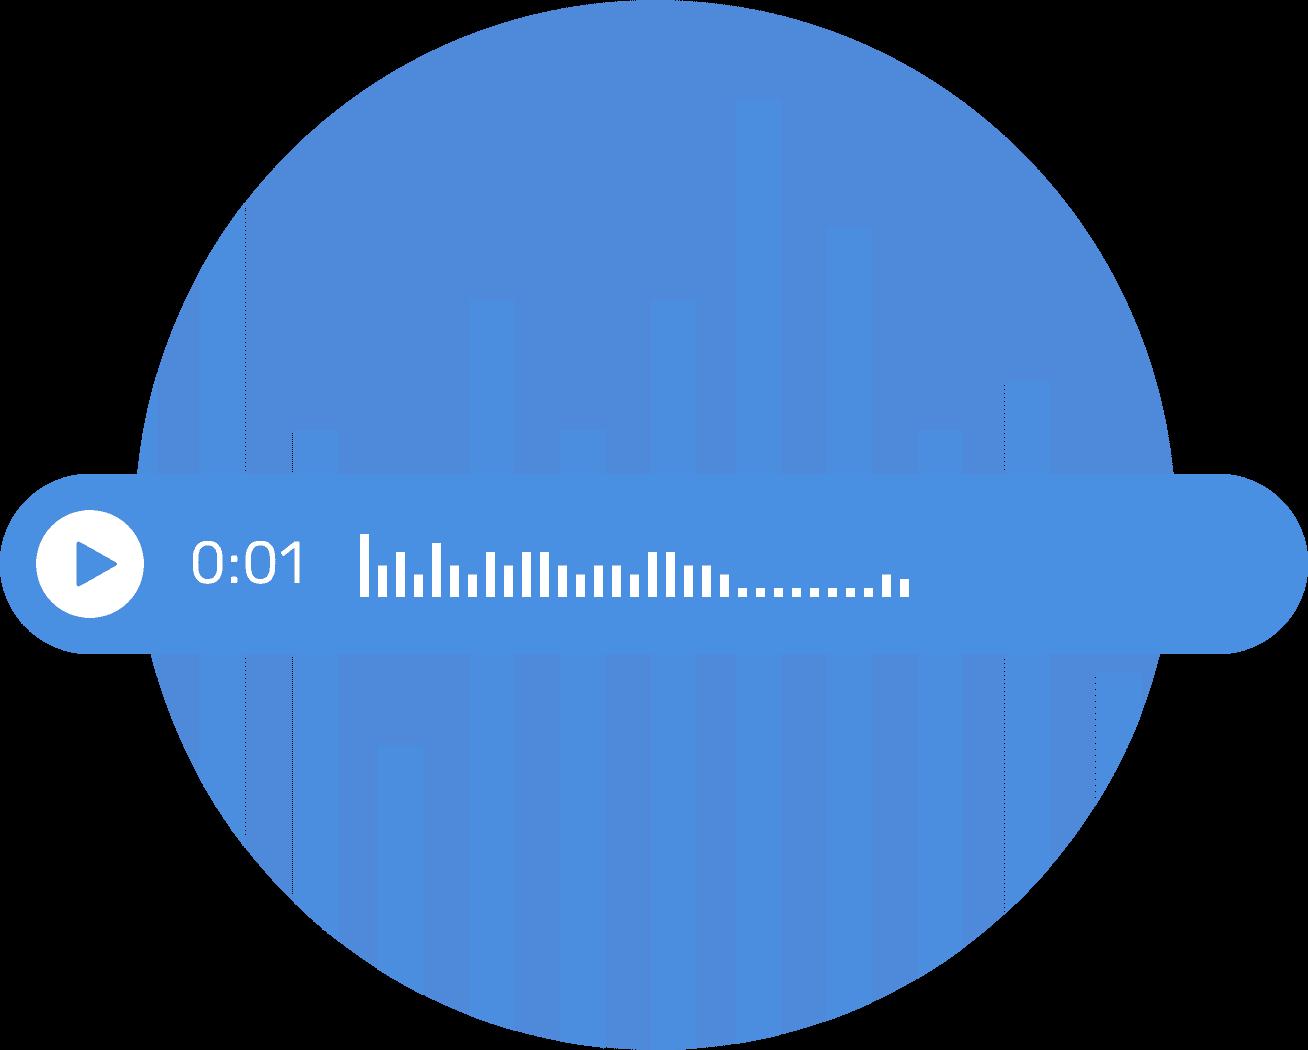 Monitor teams performance